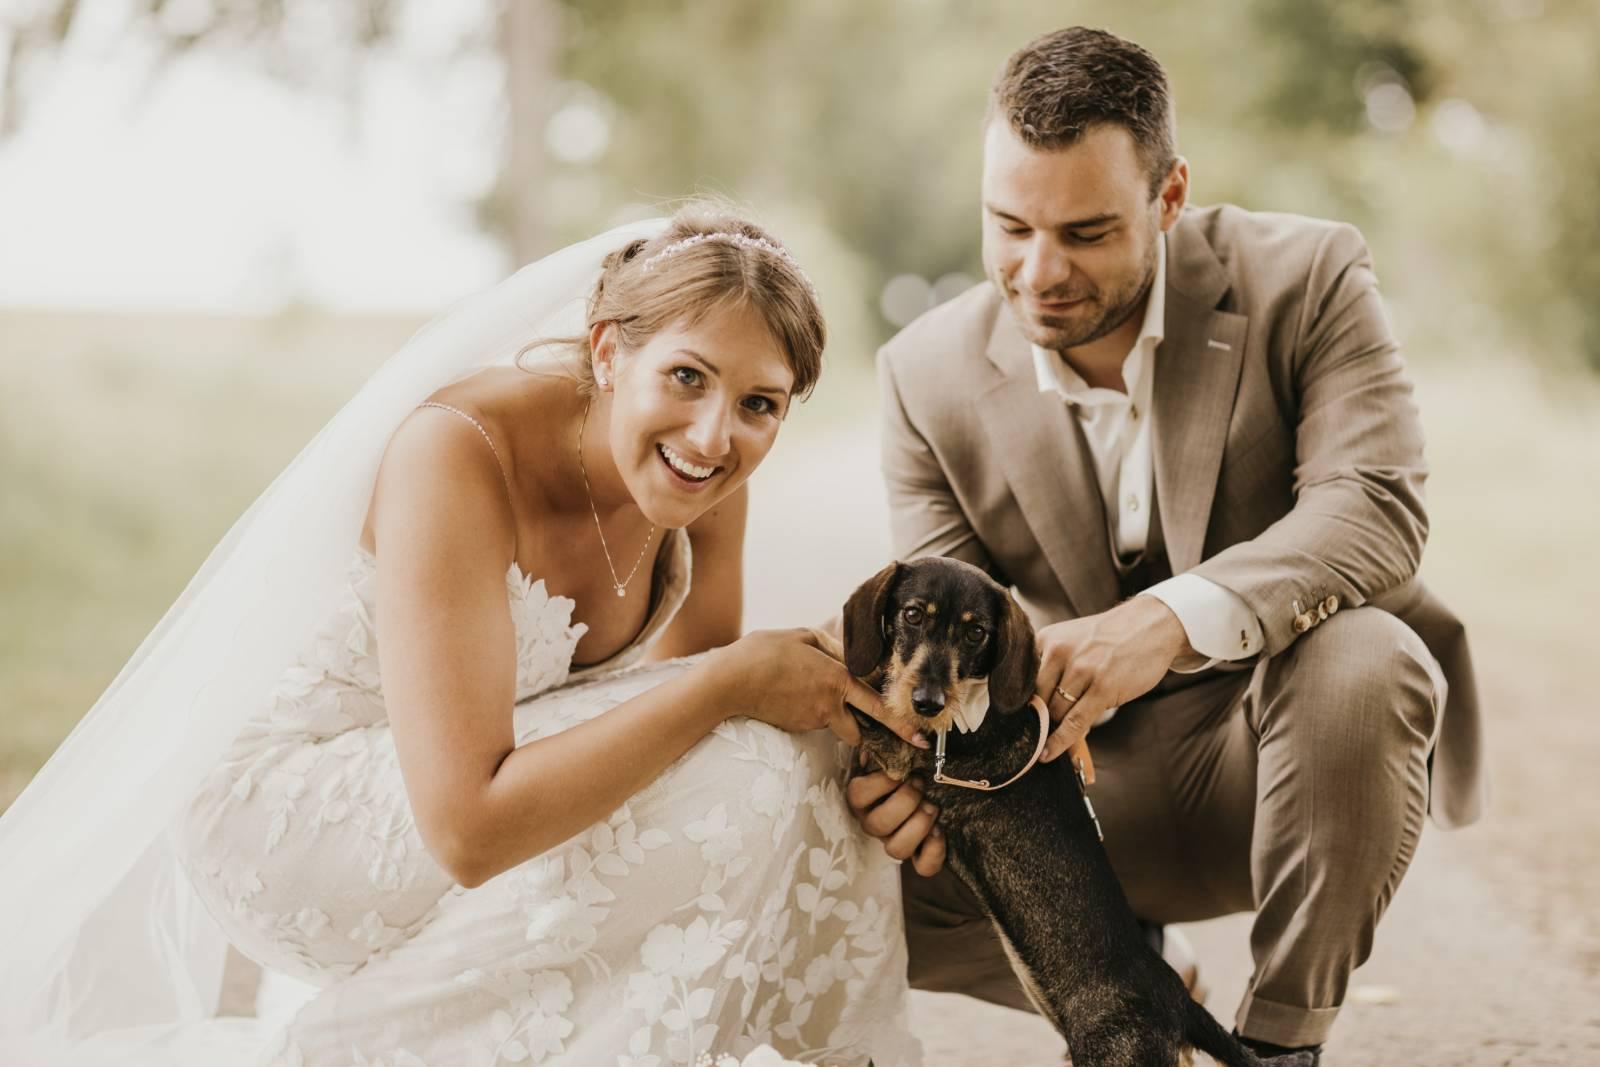 Imperish Photography - Fotograaf Silke - House of Weddings (2)